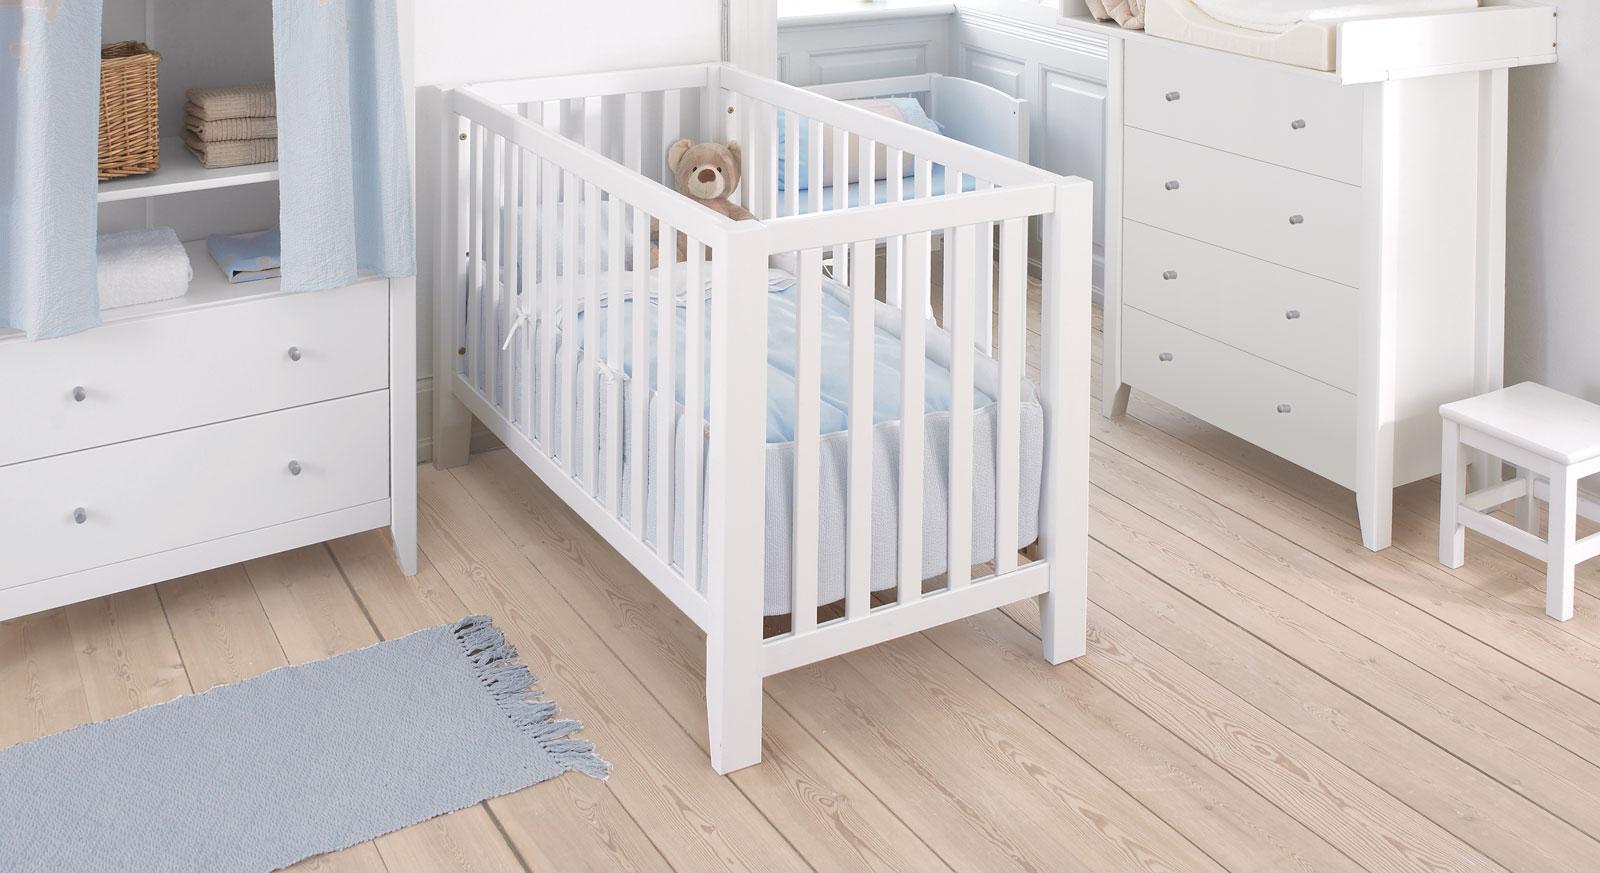 Babybett Kids Heaven aus lackiertem Massivholz